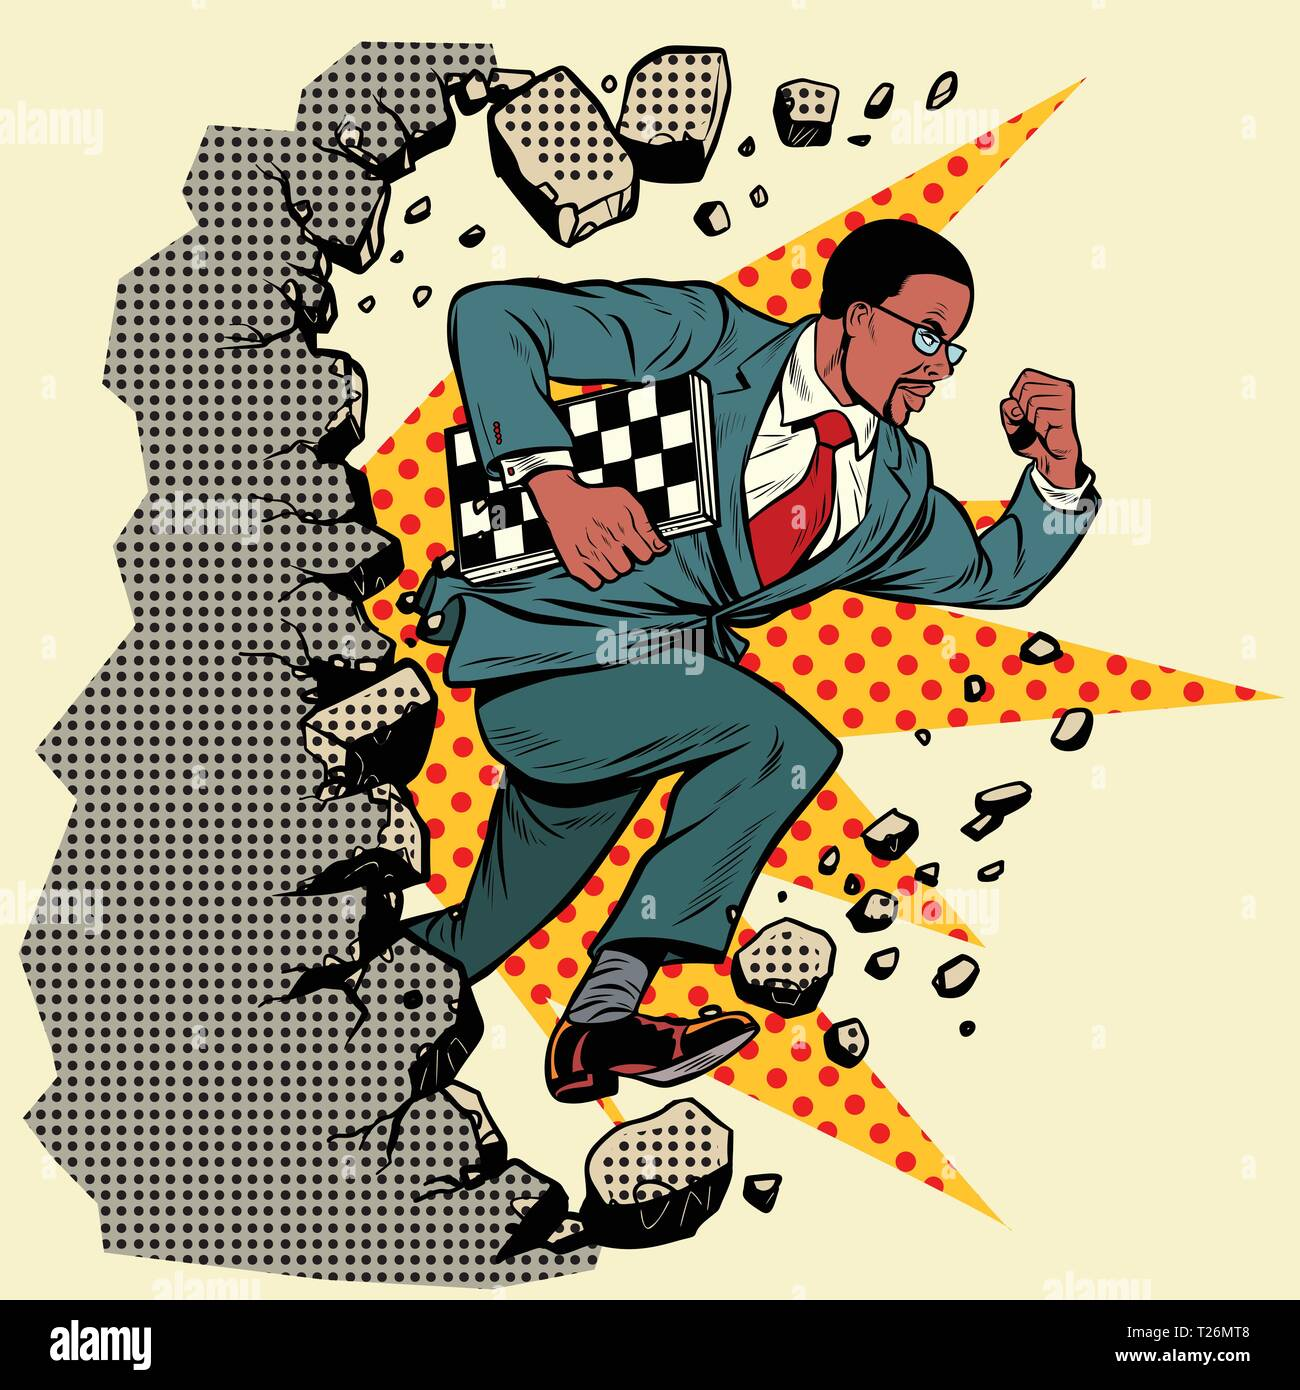 african chess grandmaster breaks a wall, destroys stereotypes. Moving forward, personal development. Pop art retro vector illustration vintage kitsch - Stock Vector